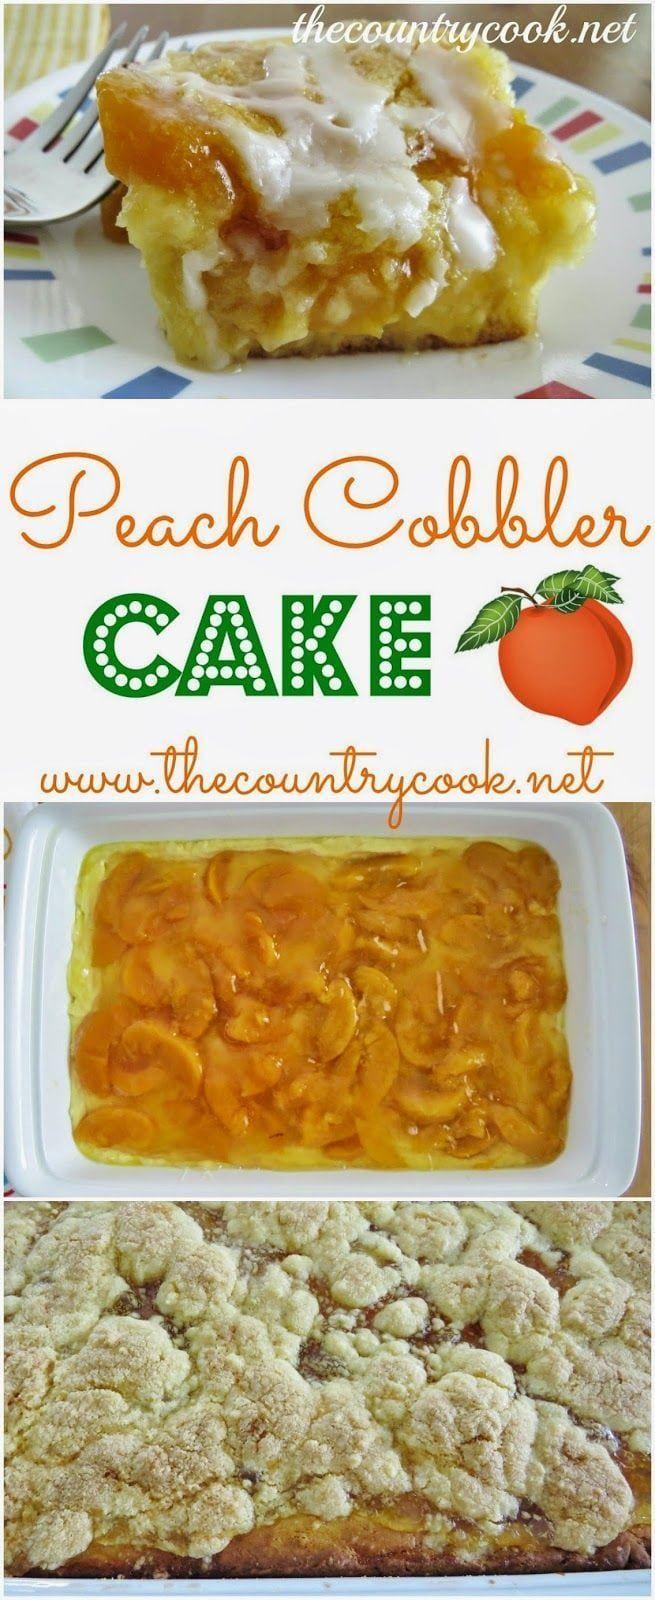 Peach Cobbler Cake #peachcobblercheesecake Peach Cobbler Cake #peachcobblercheesecake